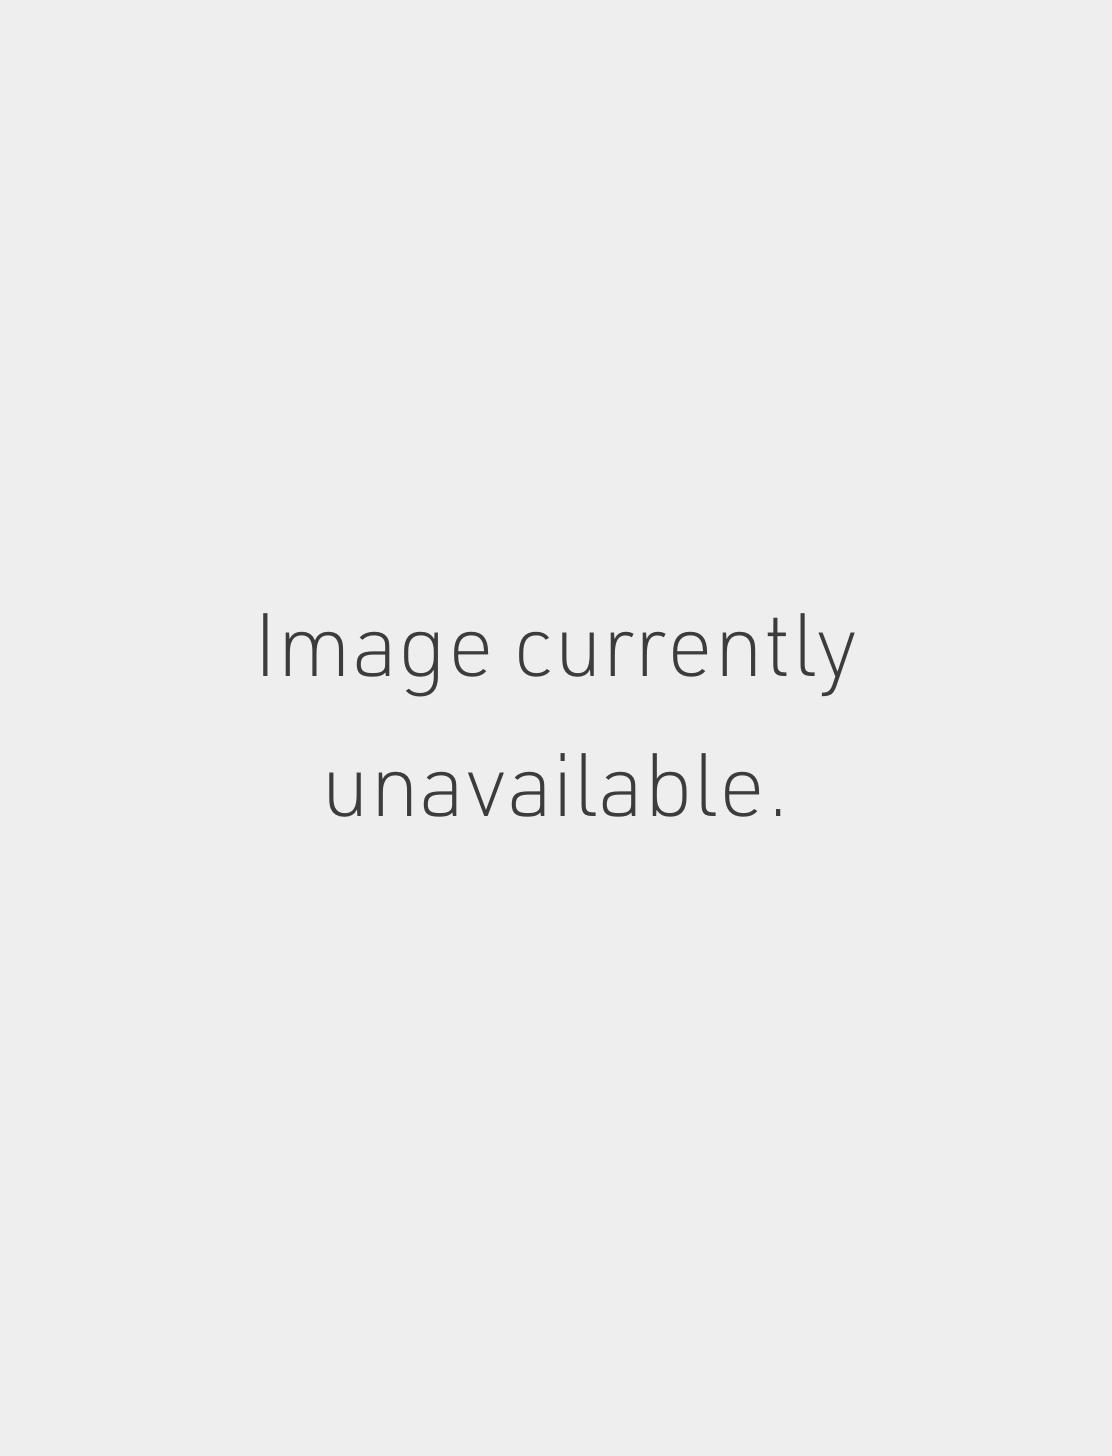 6.5mm Silhouette Diamond Short Spike Eternity Hoop Earring Image #1